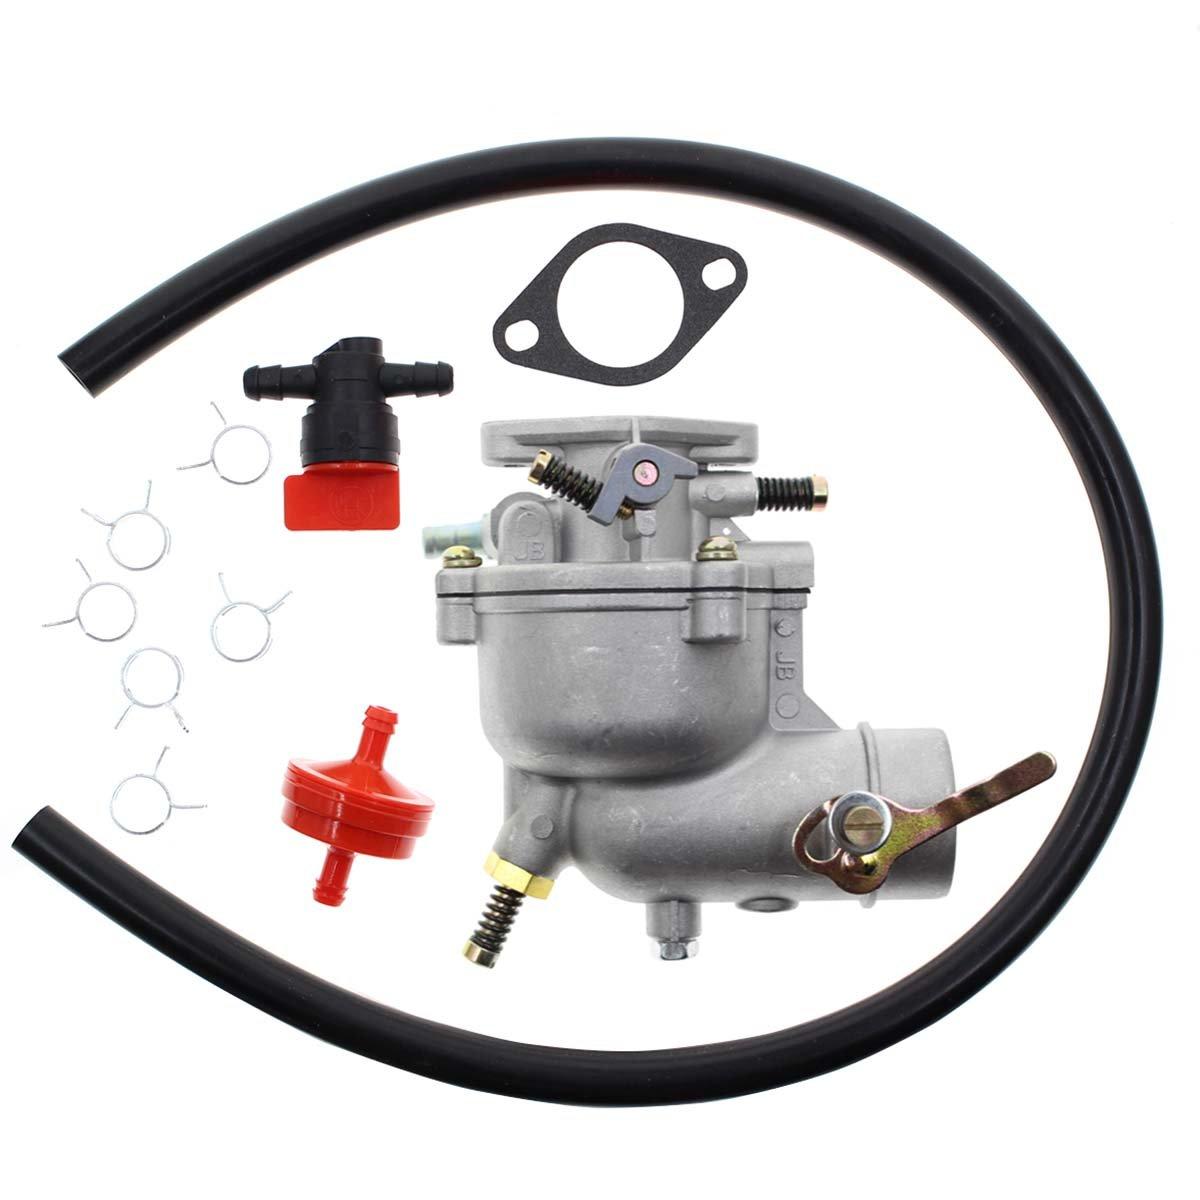 Amazon com : Carbhub Carburetor for Coleman Powermate 3250 4000 5000